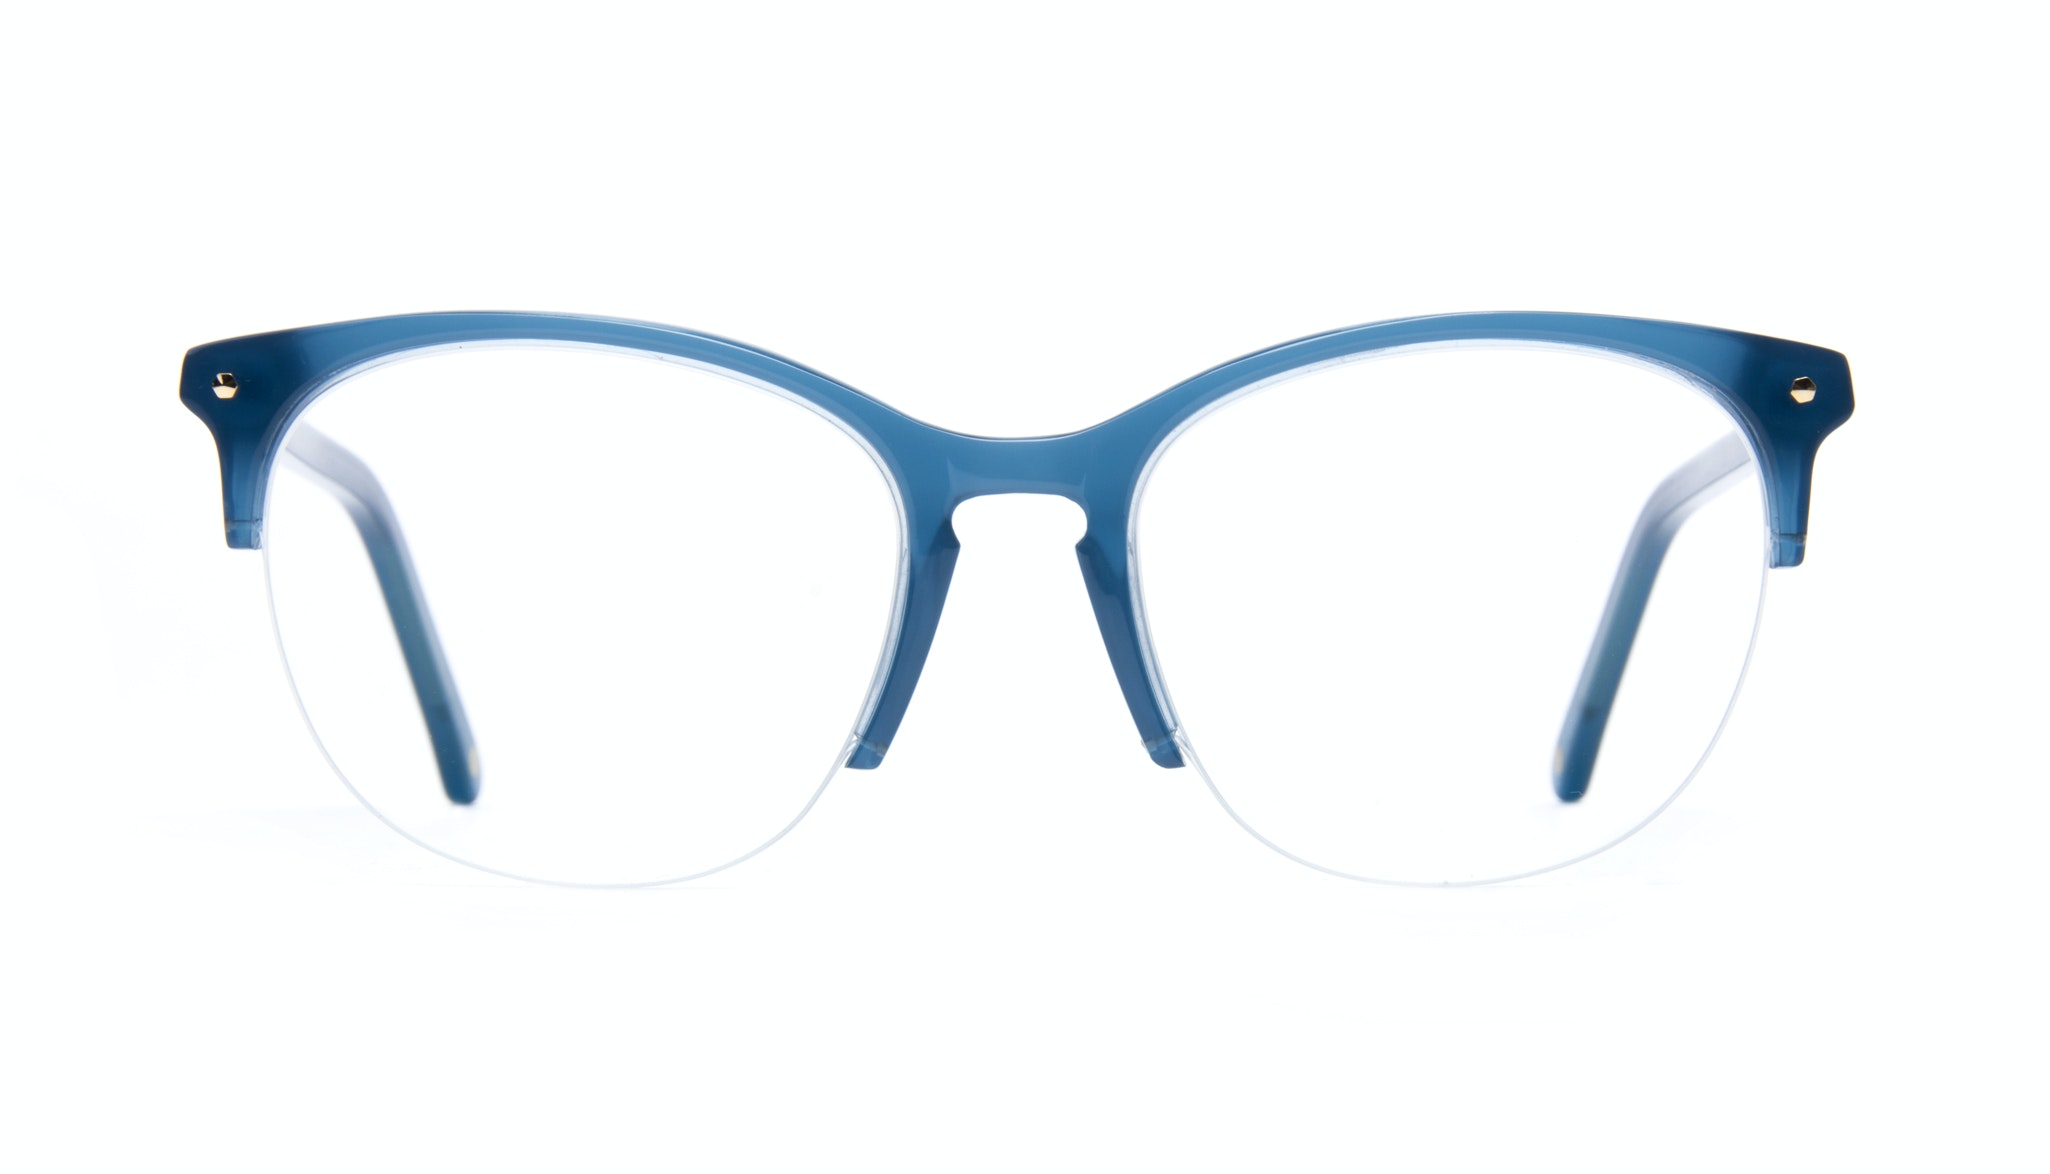 Affordable Fashion Glasses Rectangle Square Round Semi-Rimless Eyeglasses Women Nadine Light Marine